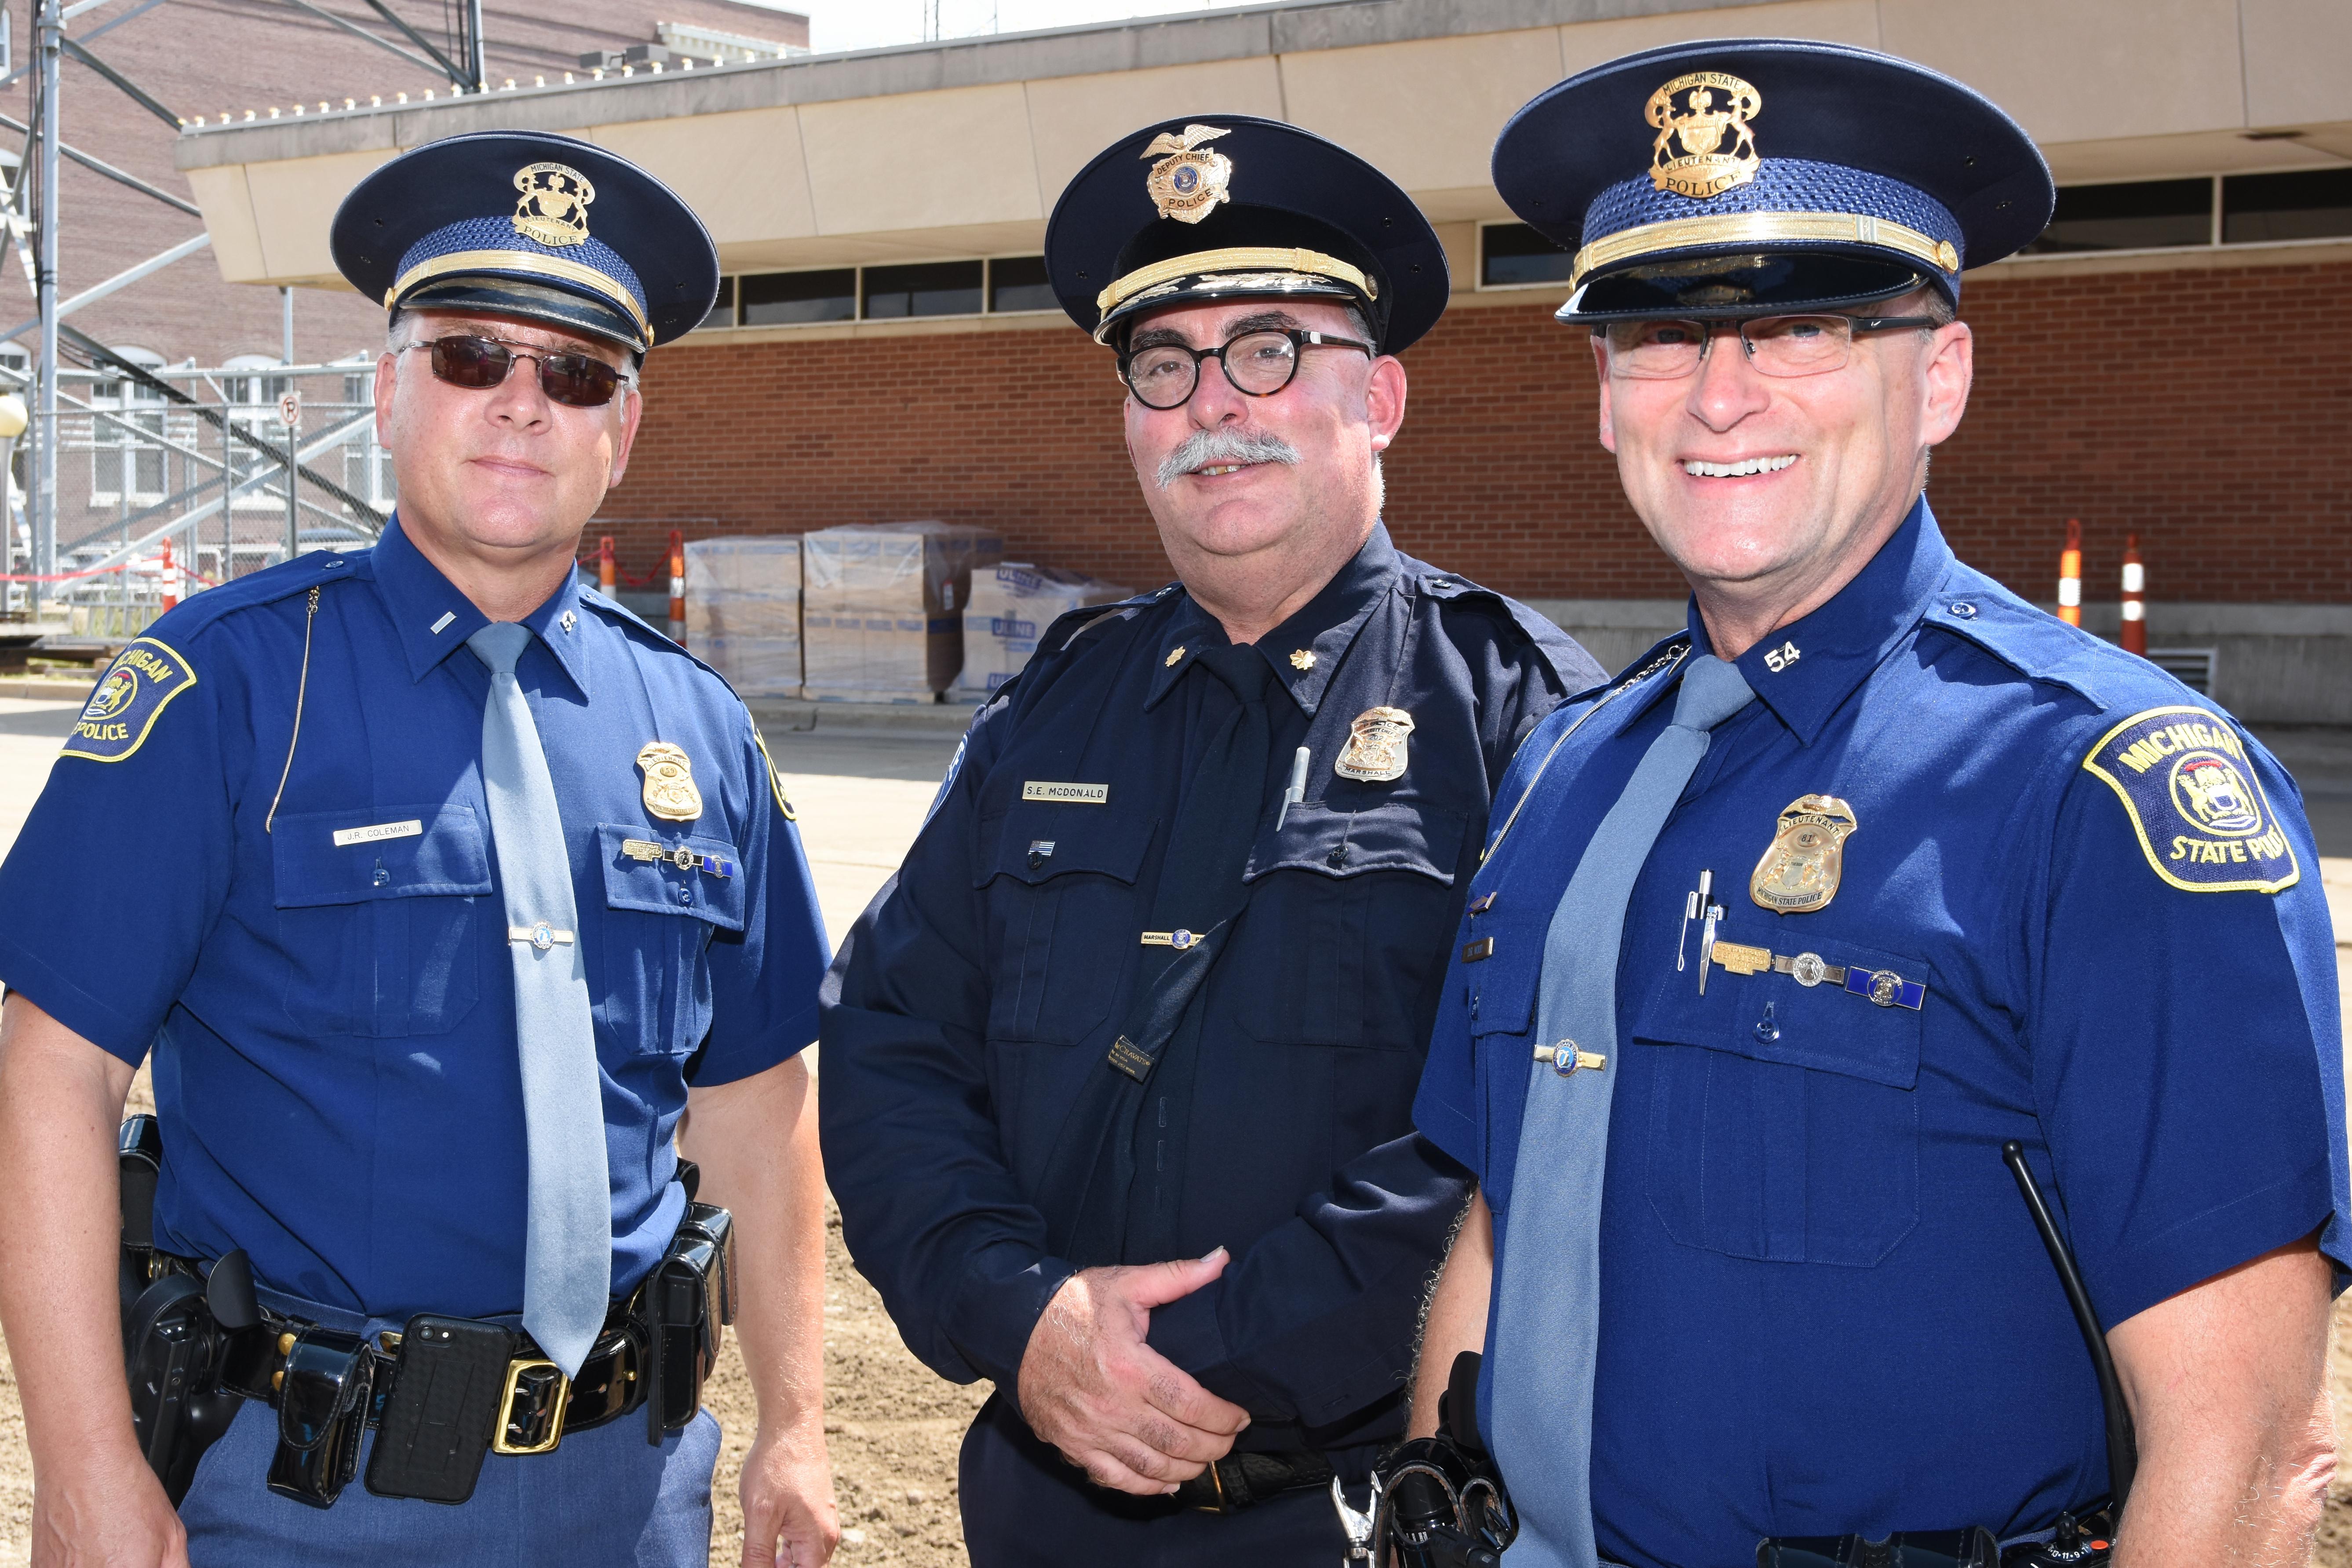 Marshall officers